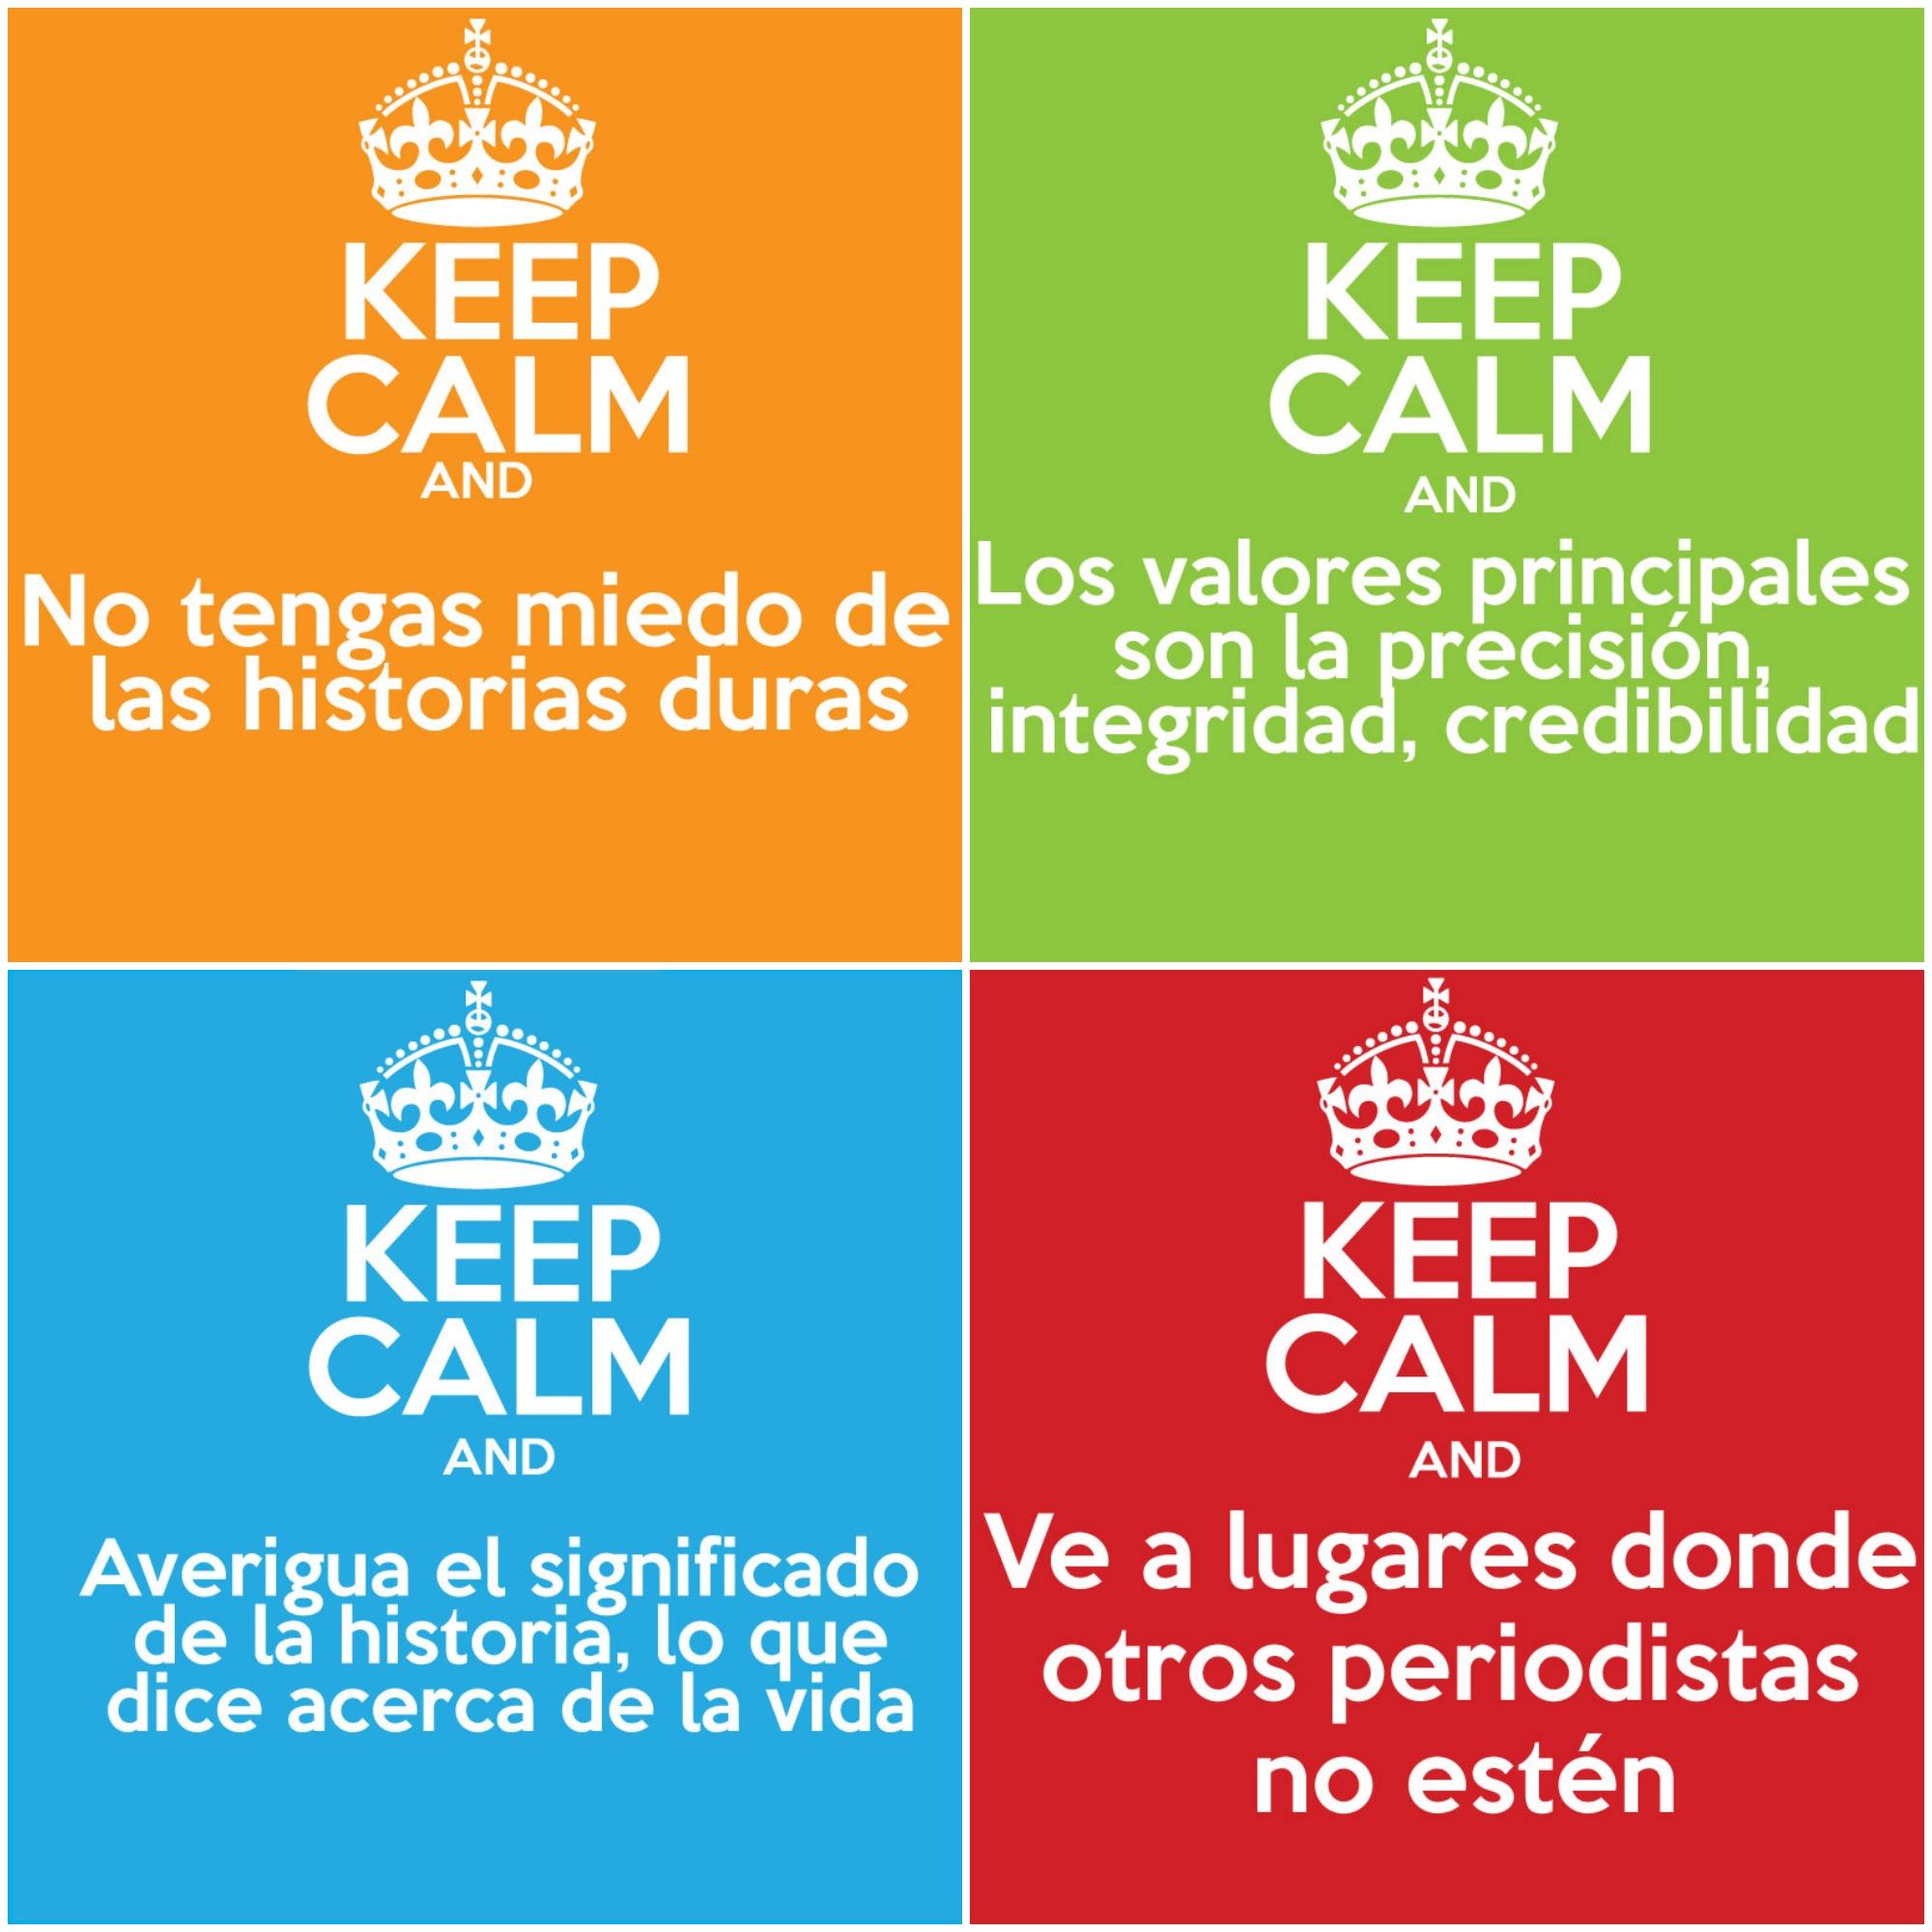 Keep Calm periodismo